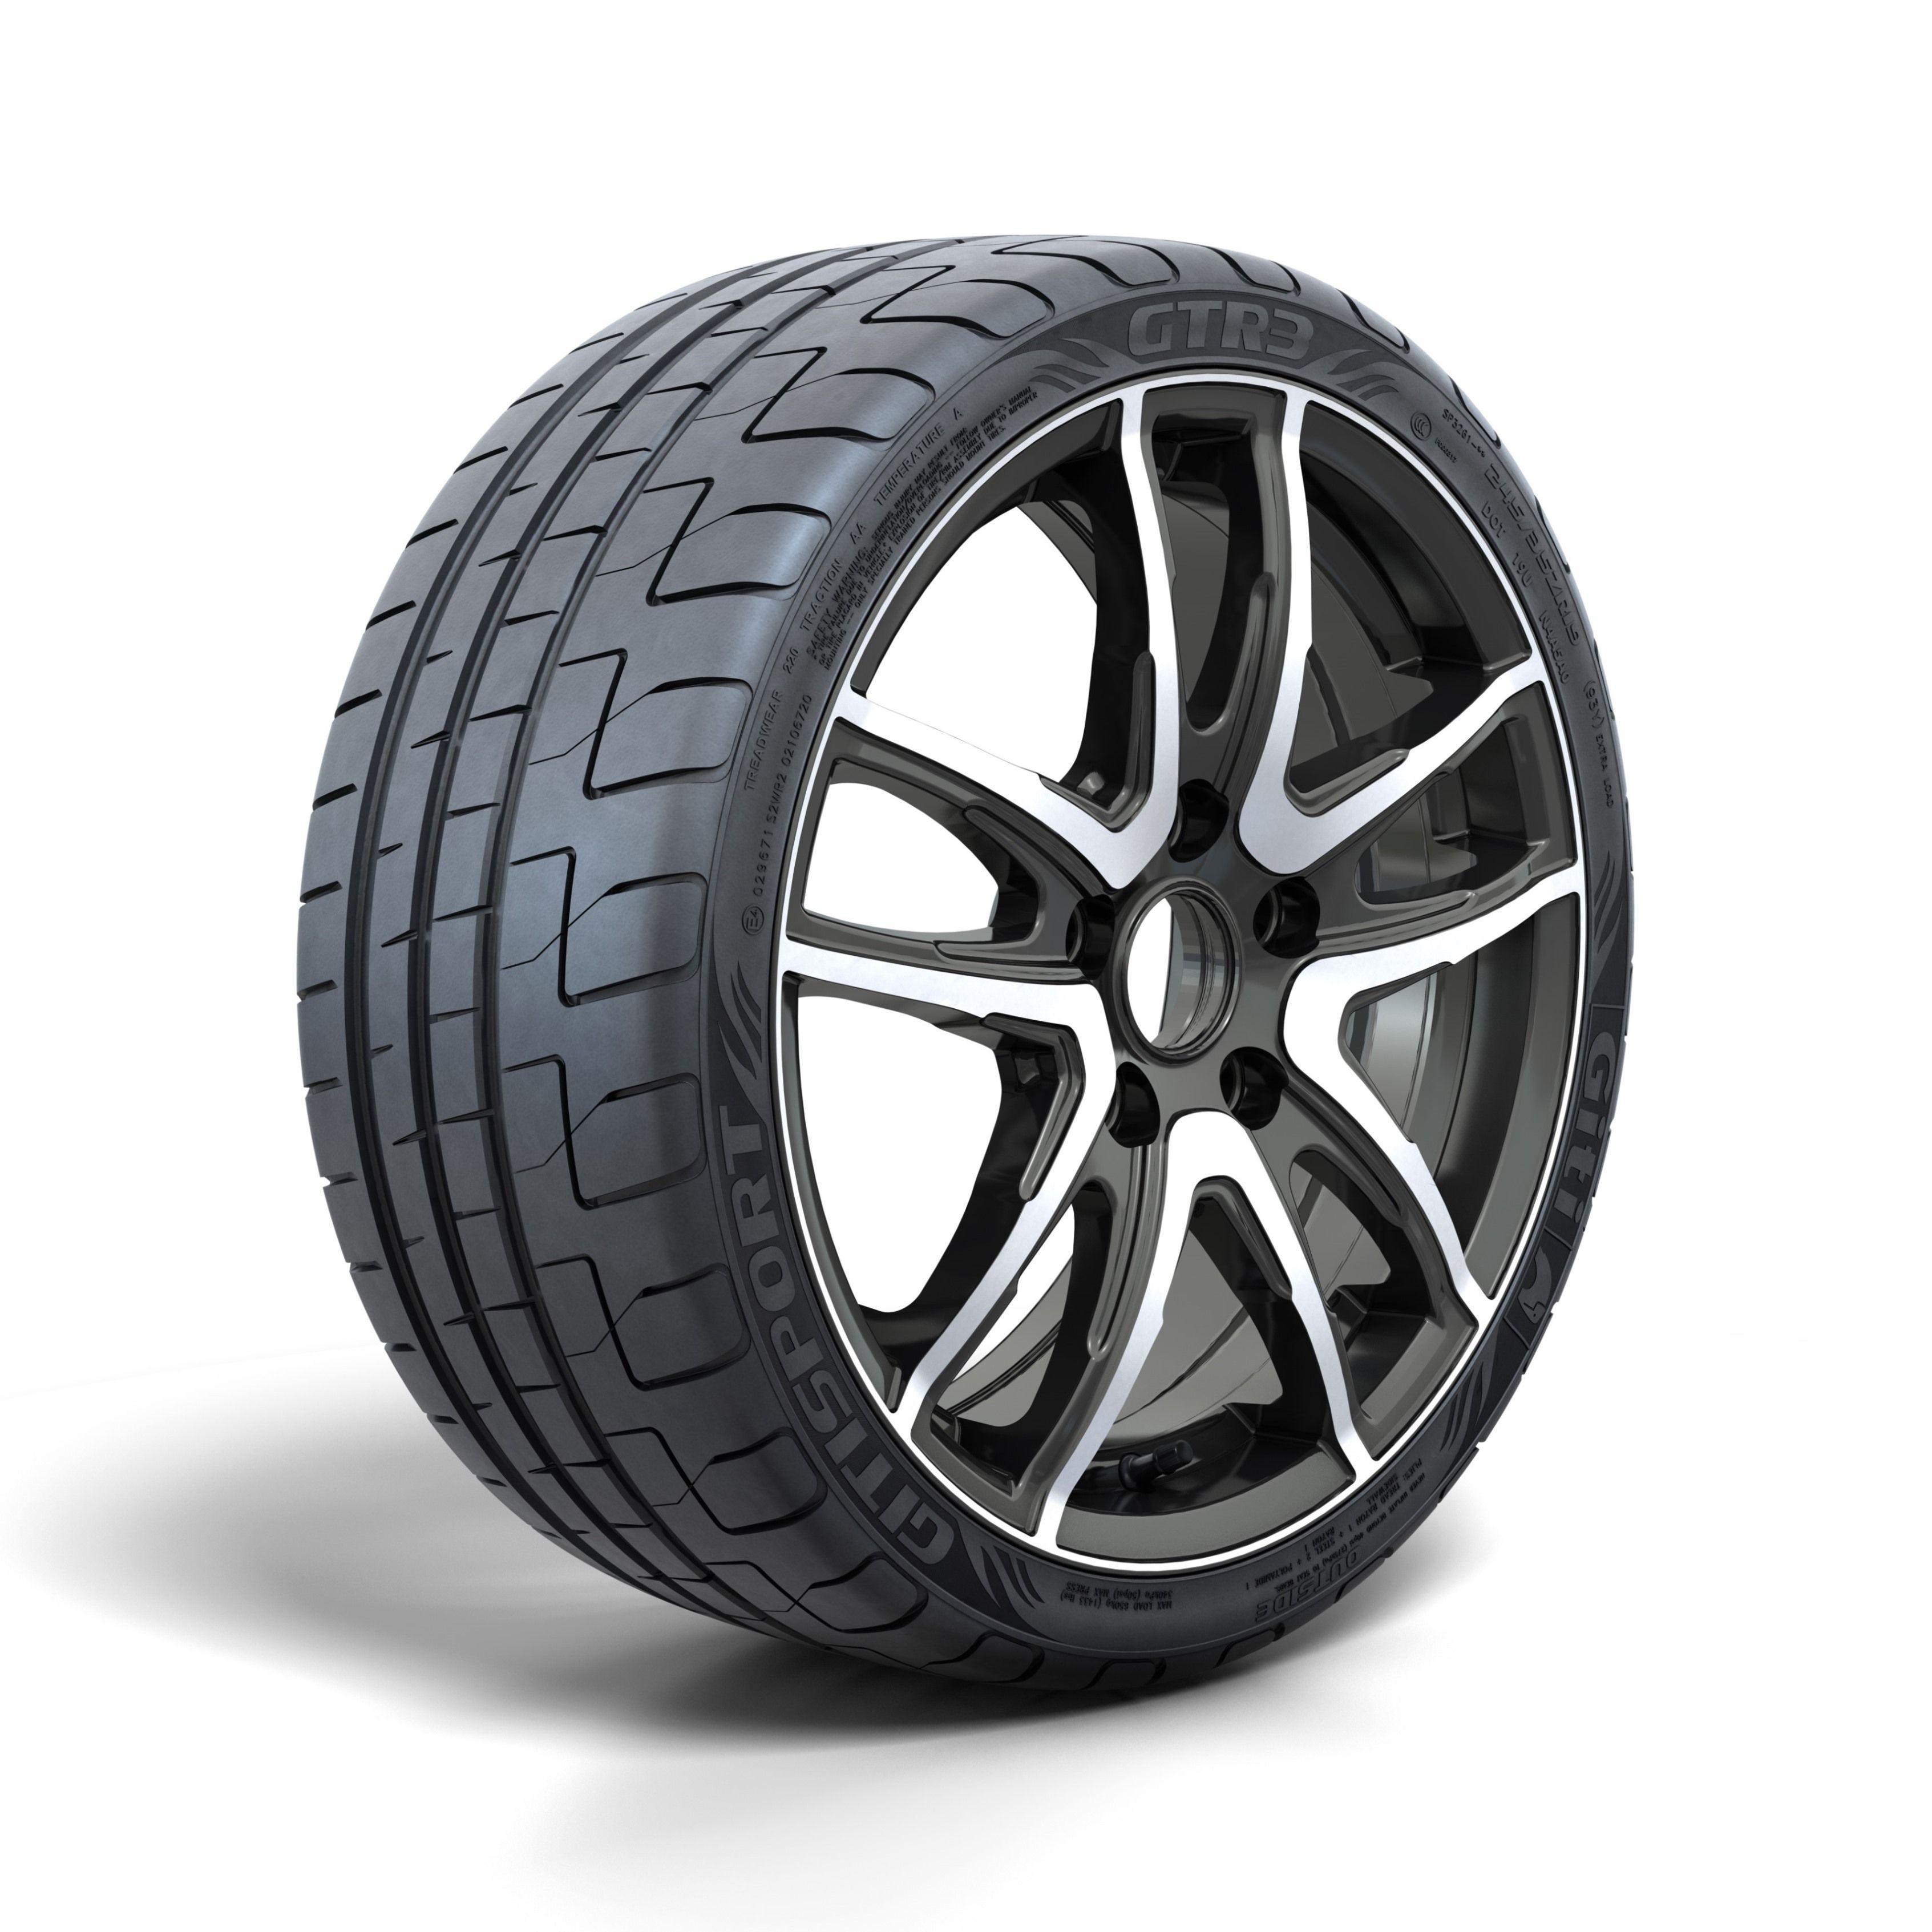 Foto de Neumático GitiSport GTR3 semi-slick de Giti Tire